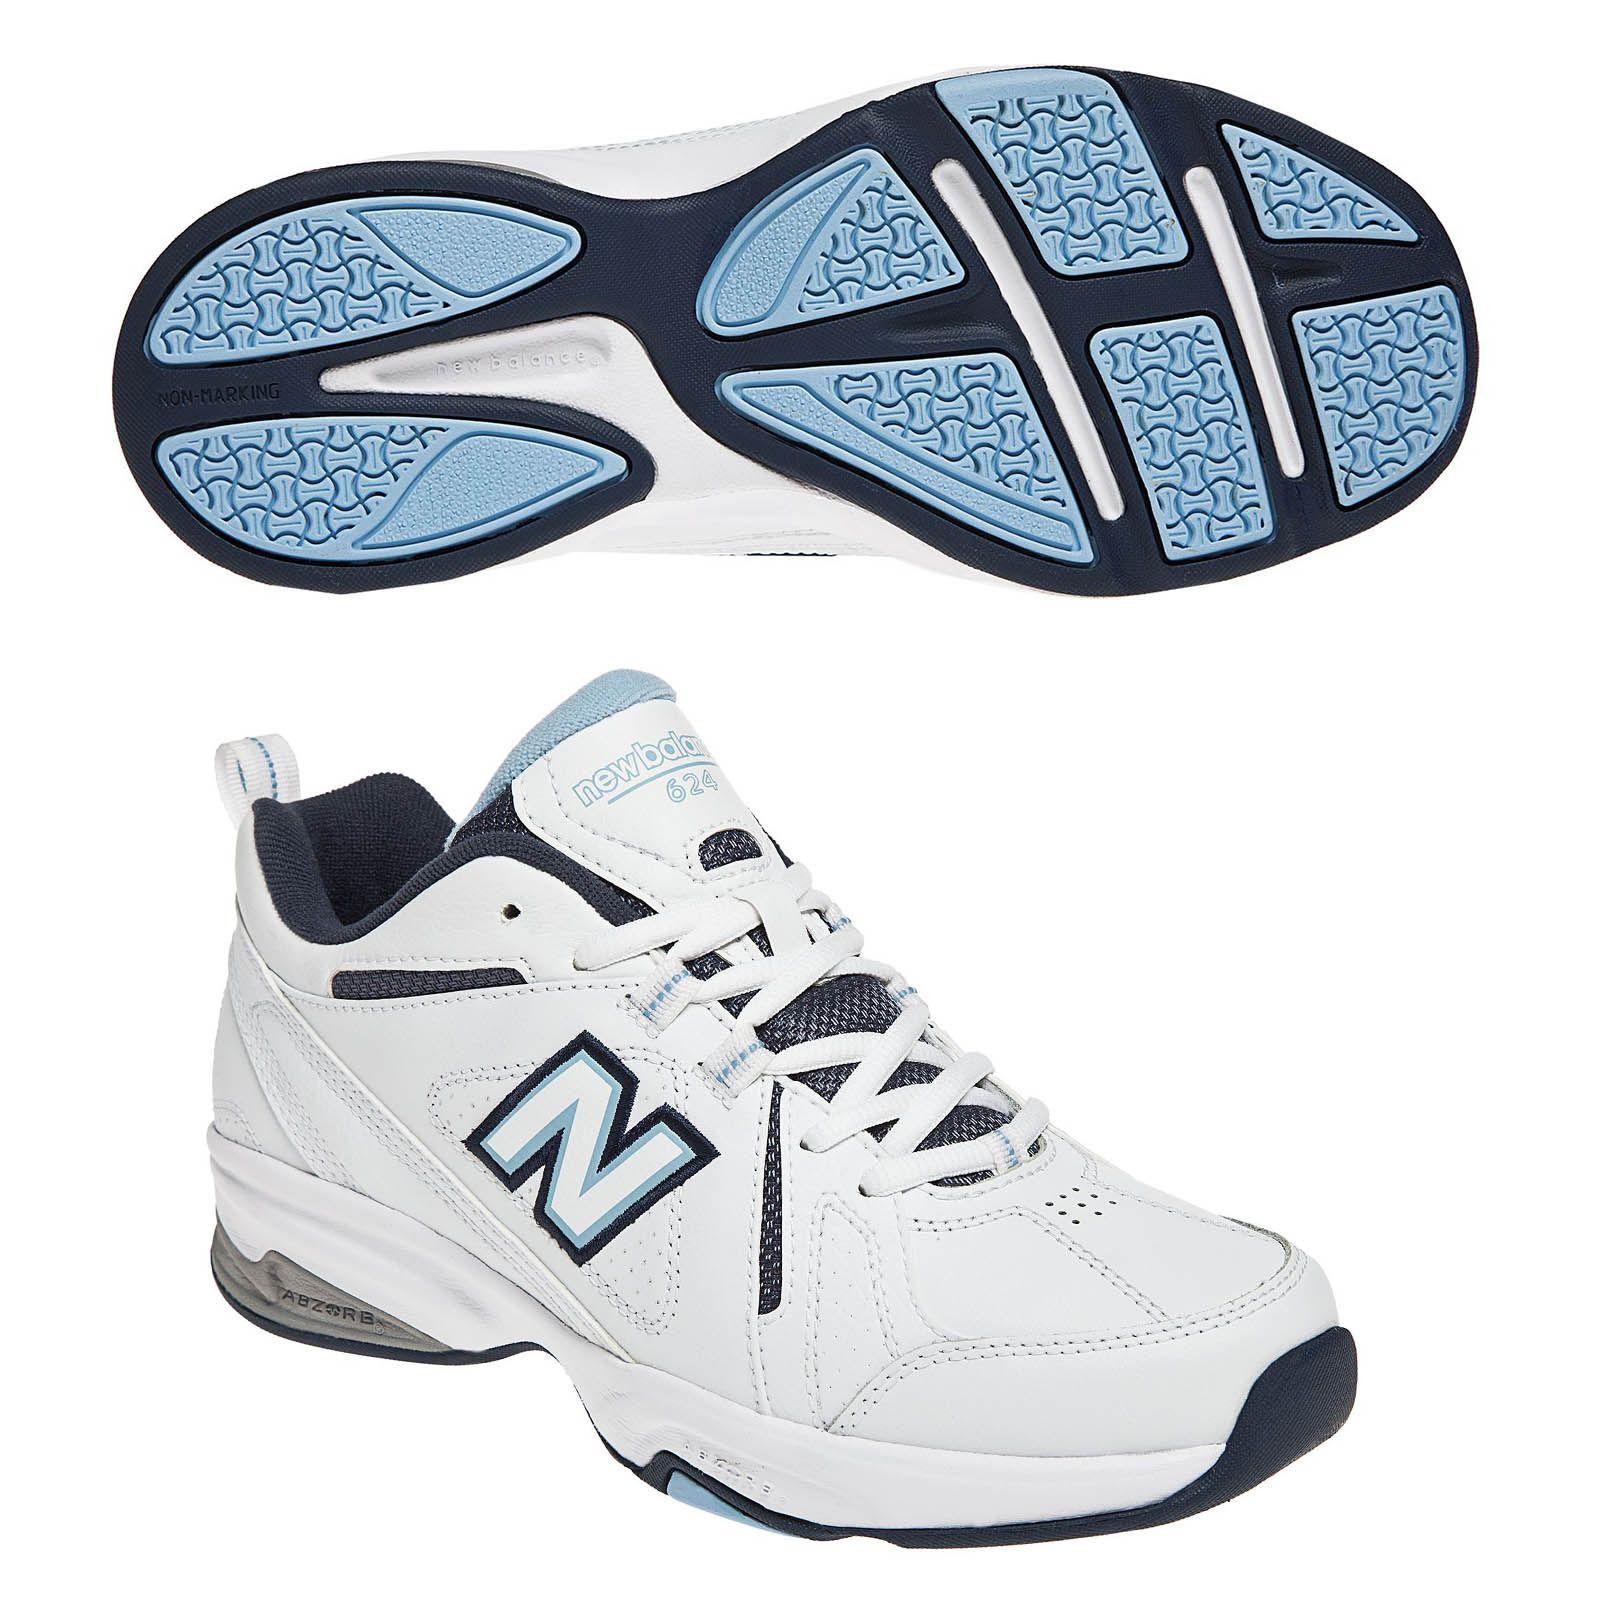 womens_cross_training_shoes_new_balance_wx624wb_womens_cross_training